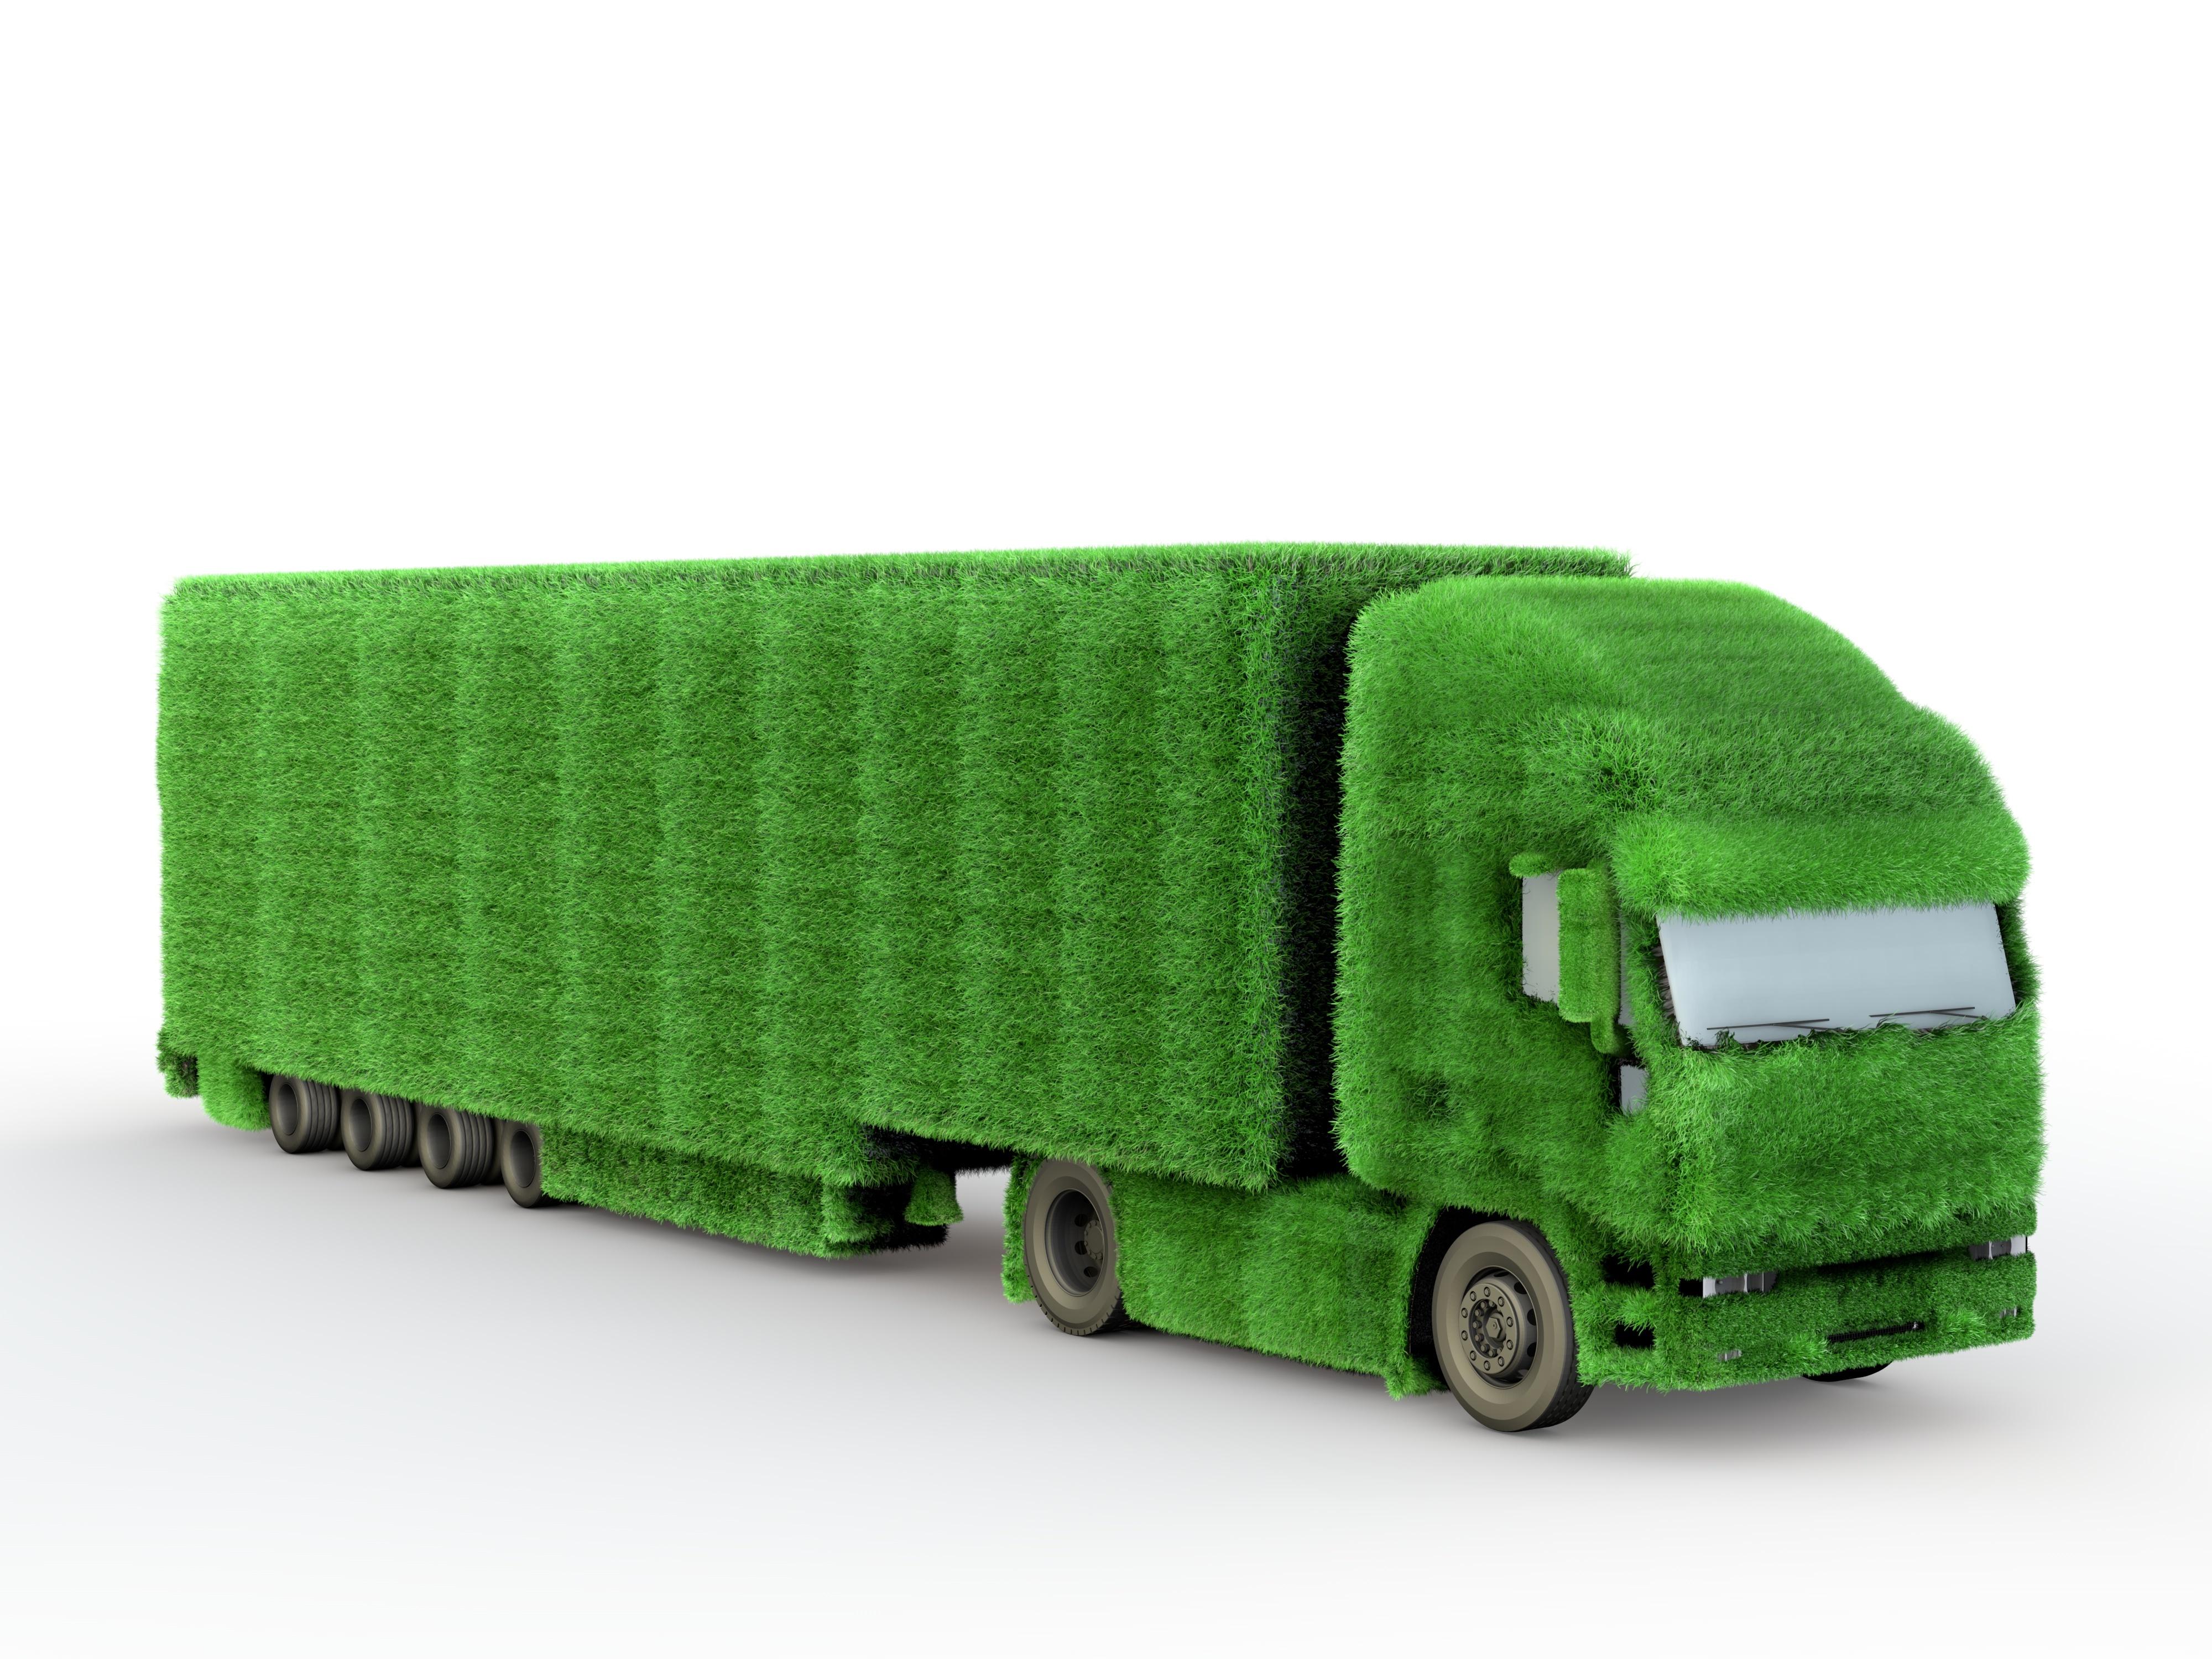 Green Truck-AdobeStock_40942209